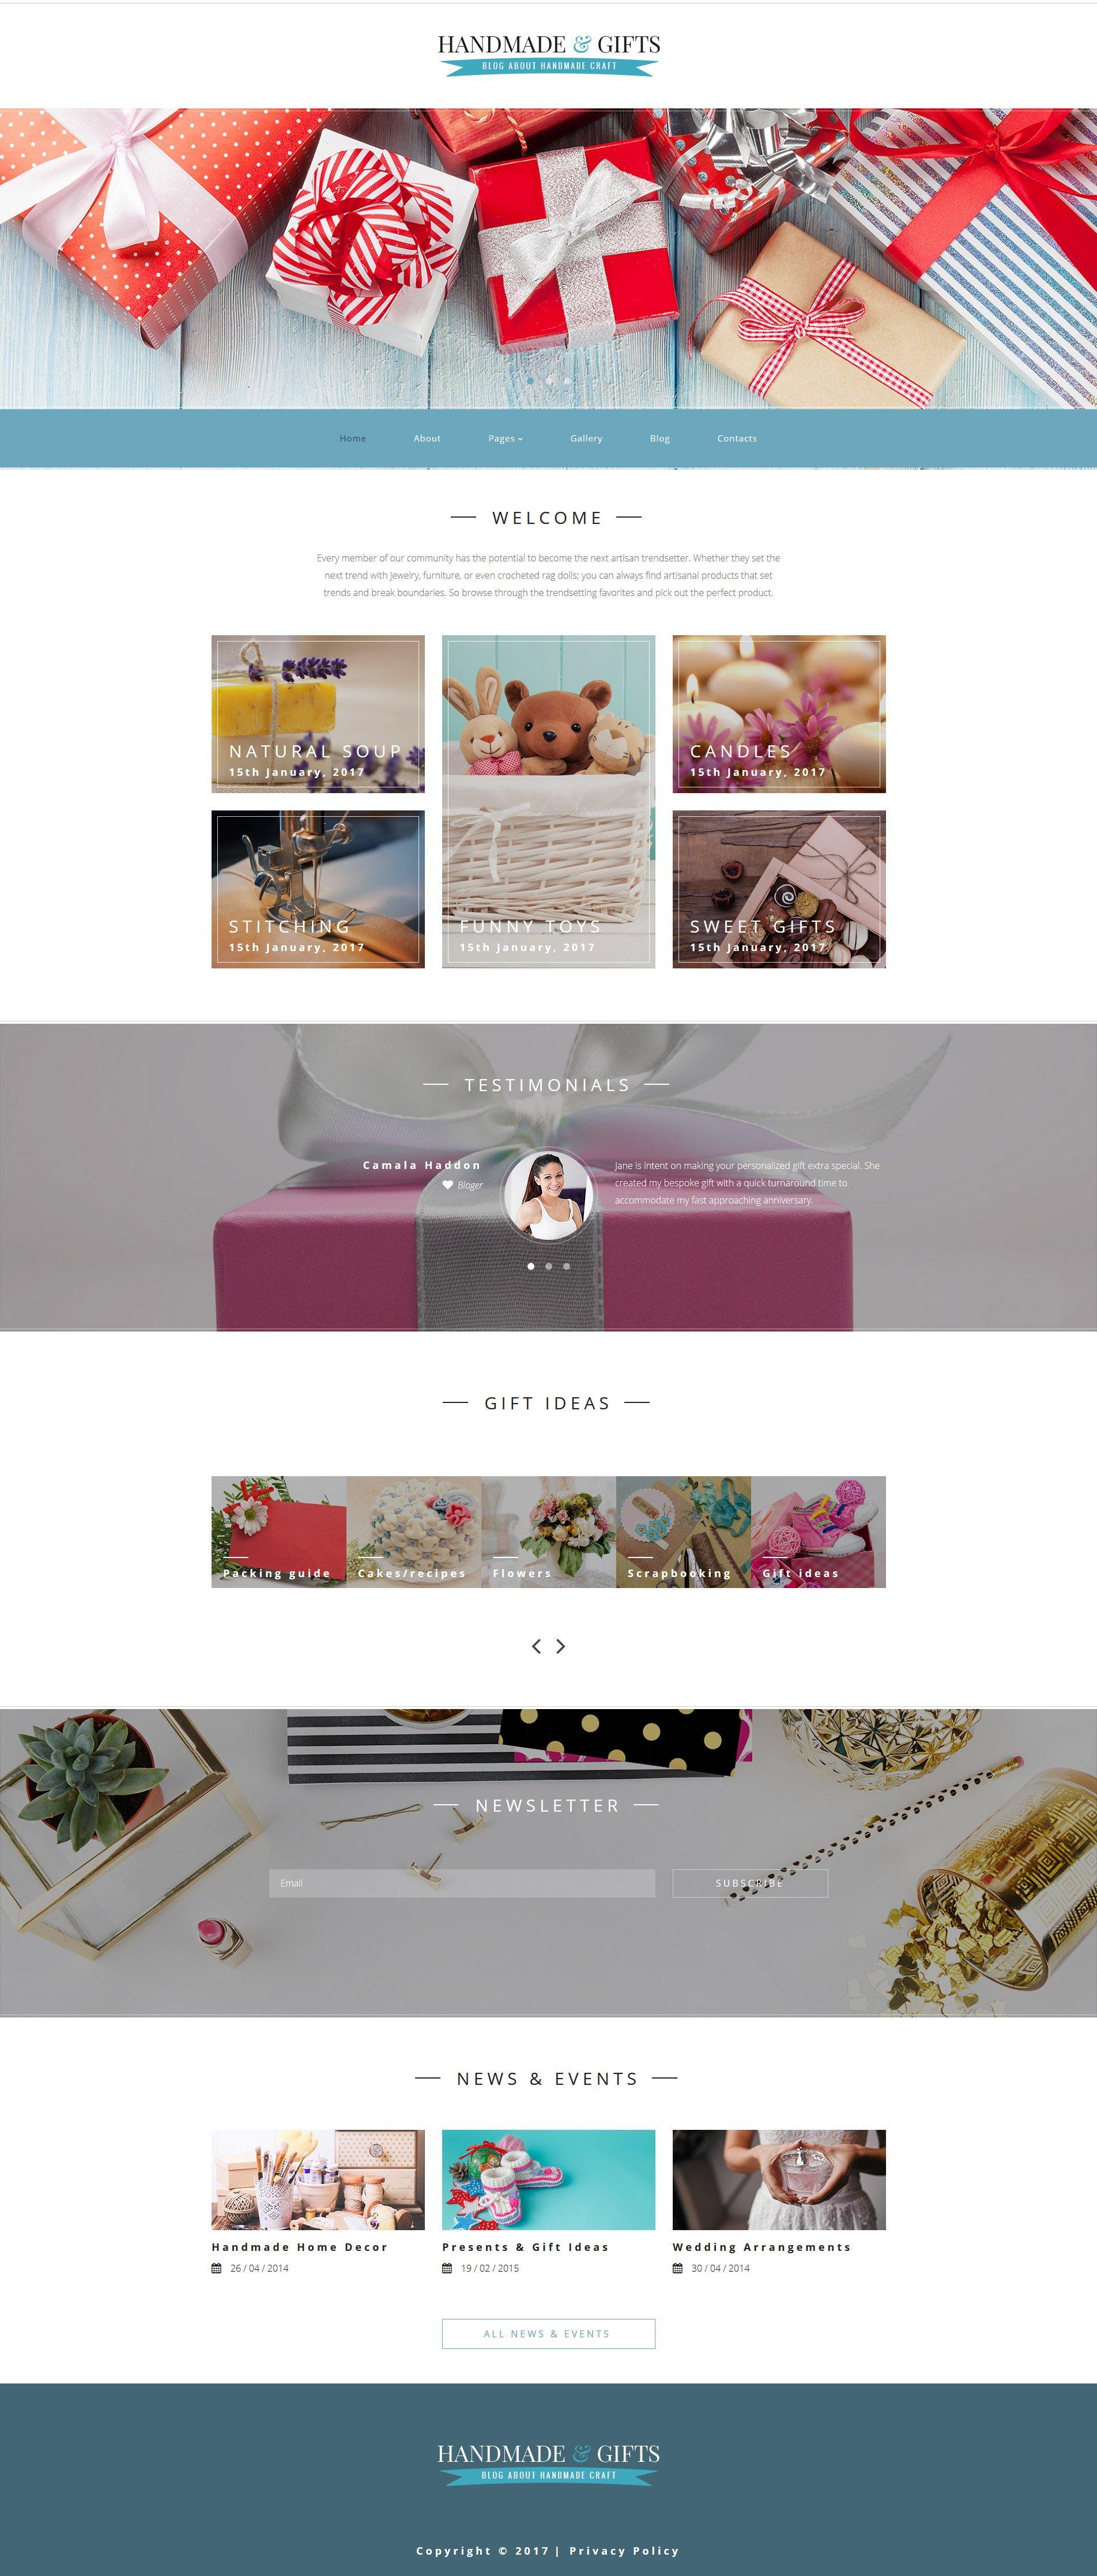 """Handmade & Gifts - Crafts Blog and Gift Store"" Responsive Joomla Template №62277 - screenshot"